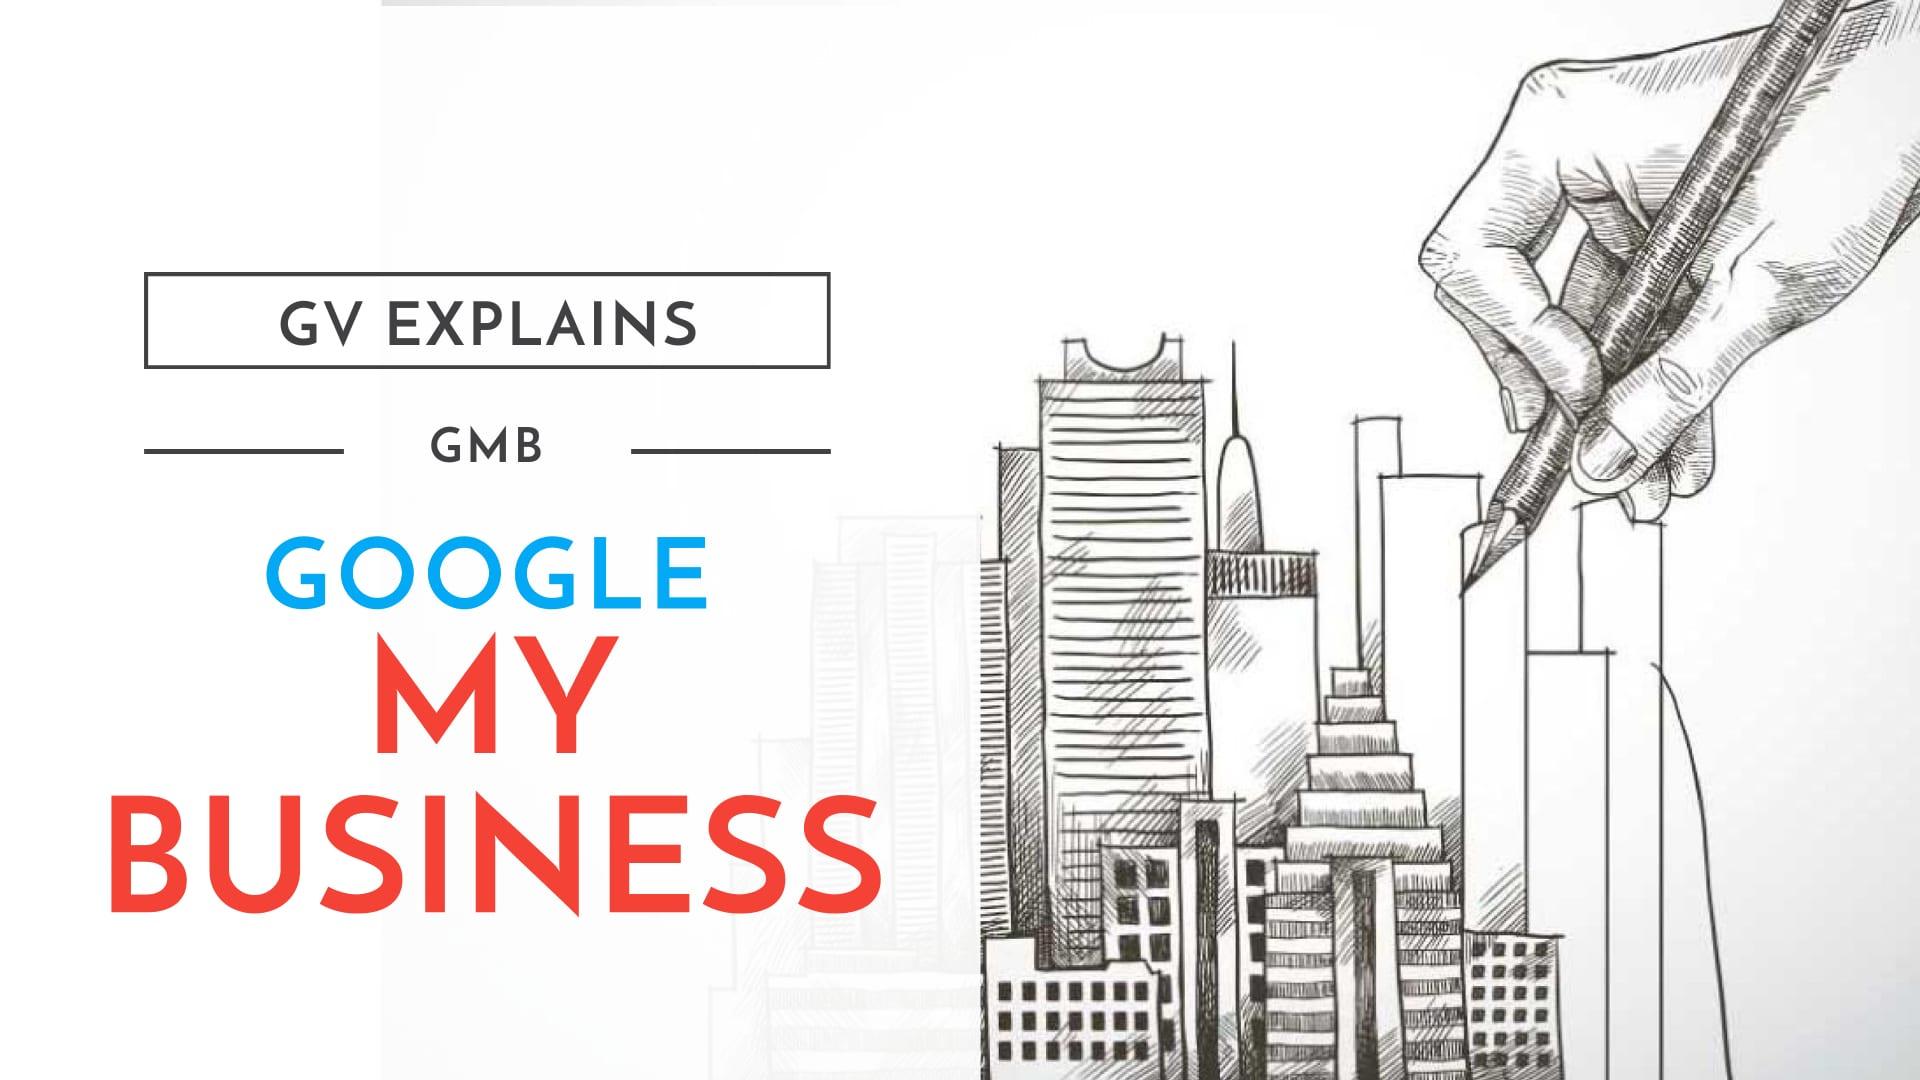 GV Explains GMB Google My Business